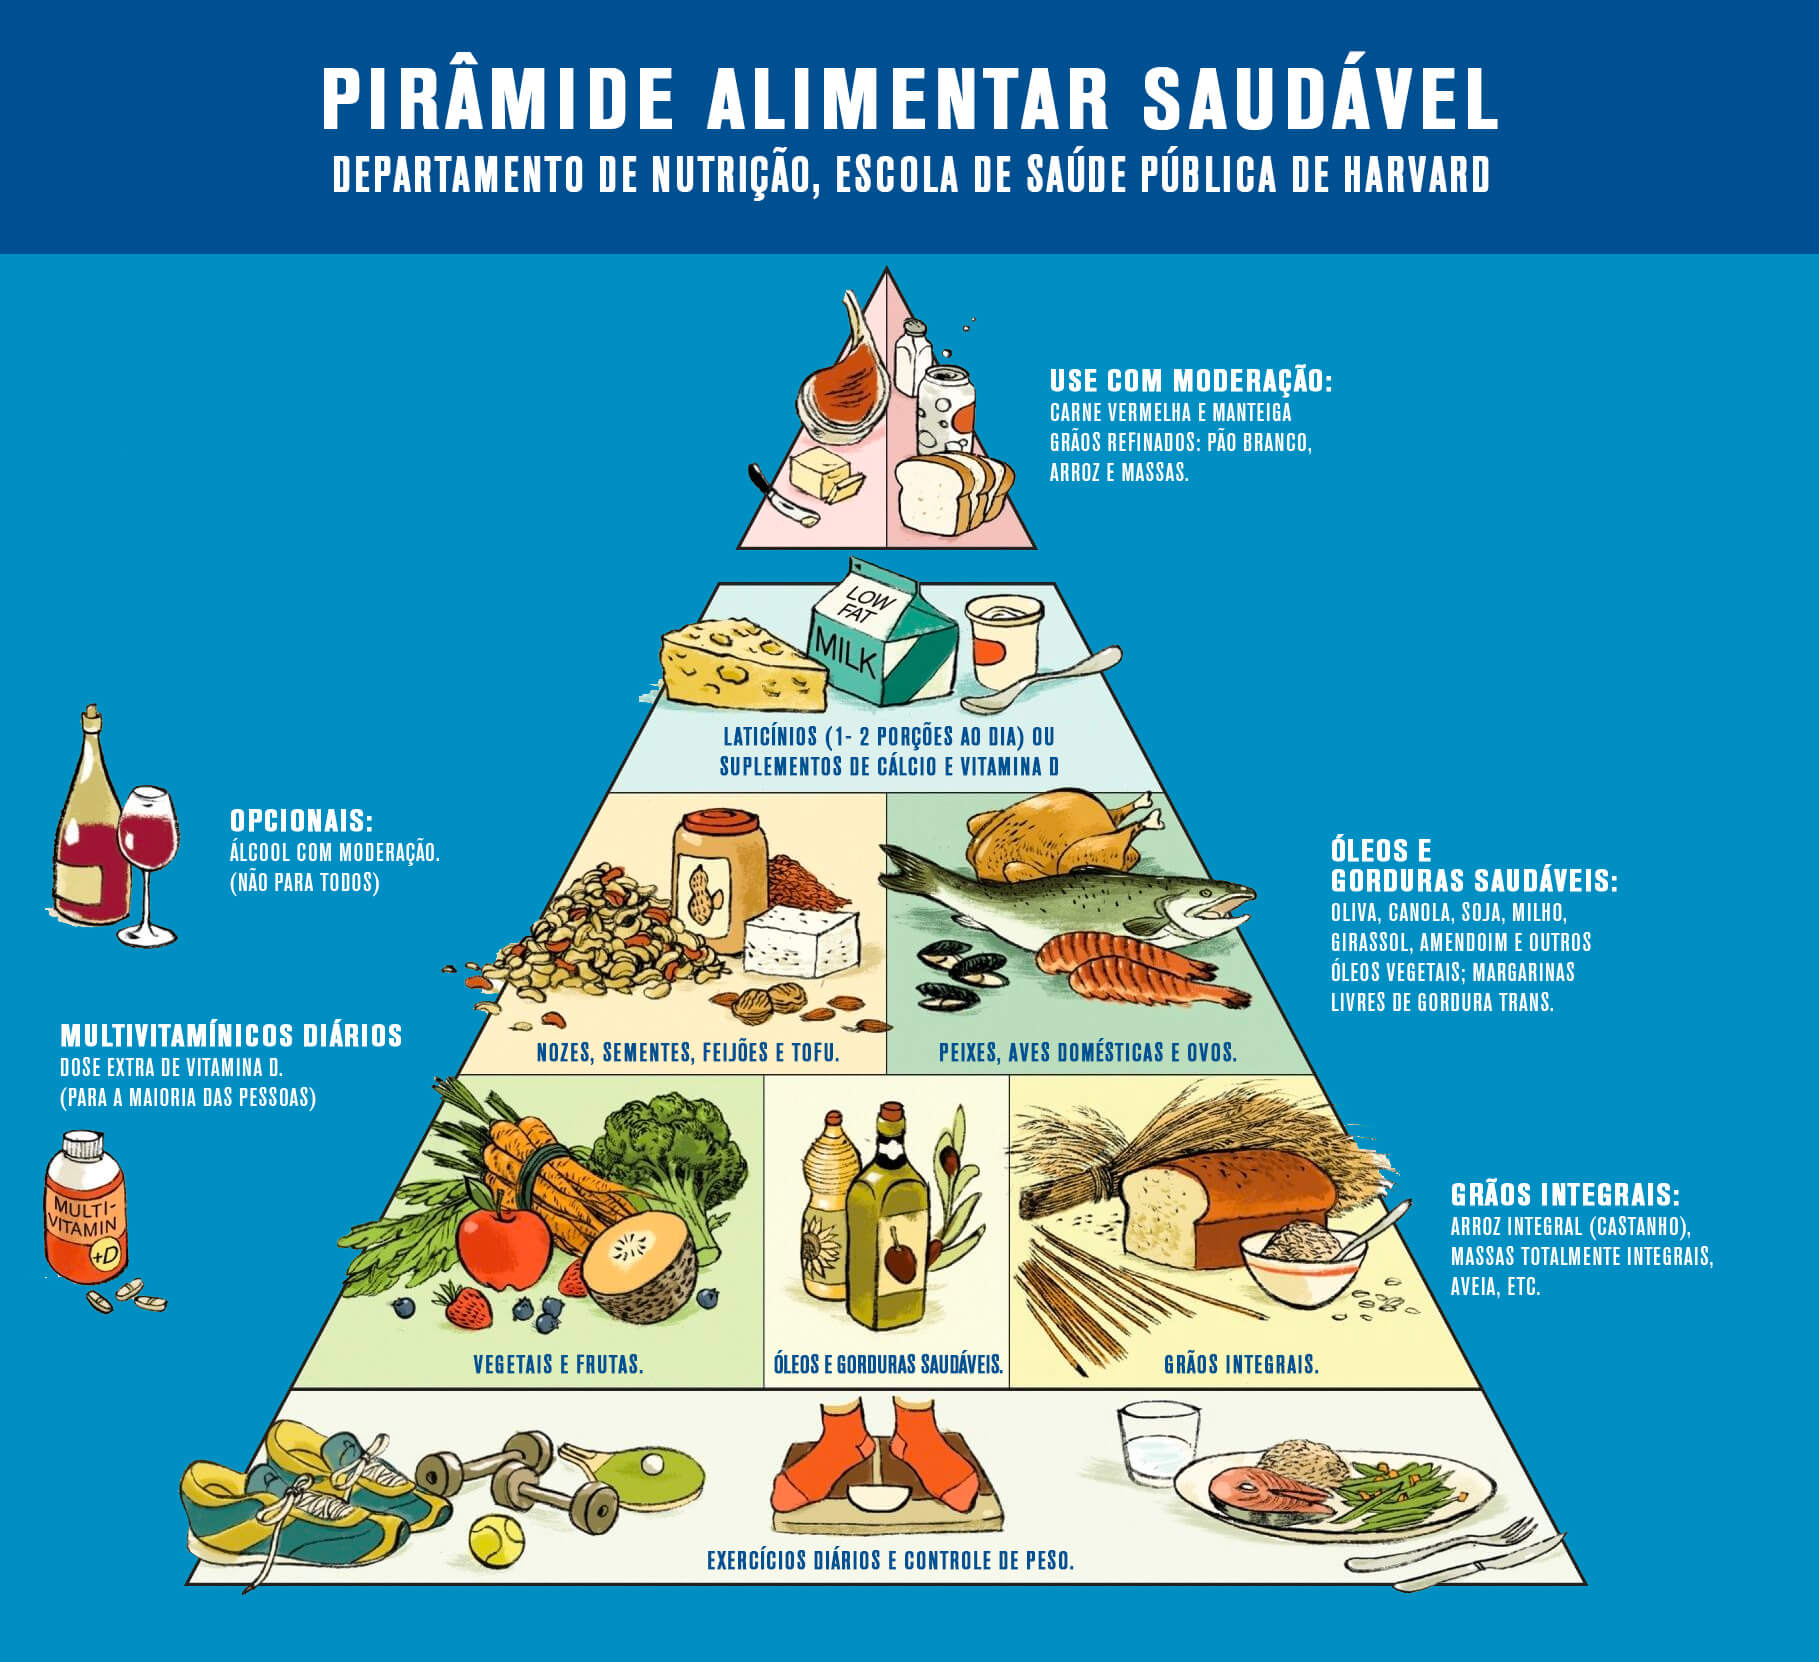 Como a pirâmide alimentar pode orientar sua dieta - Catarinense Pharma